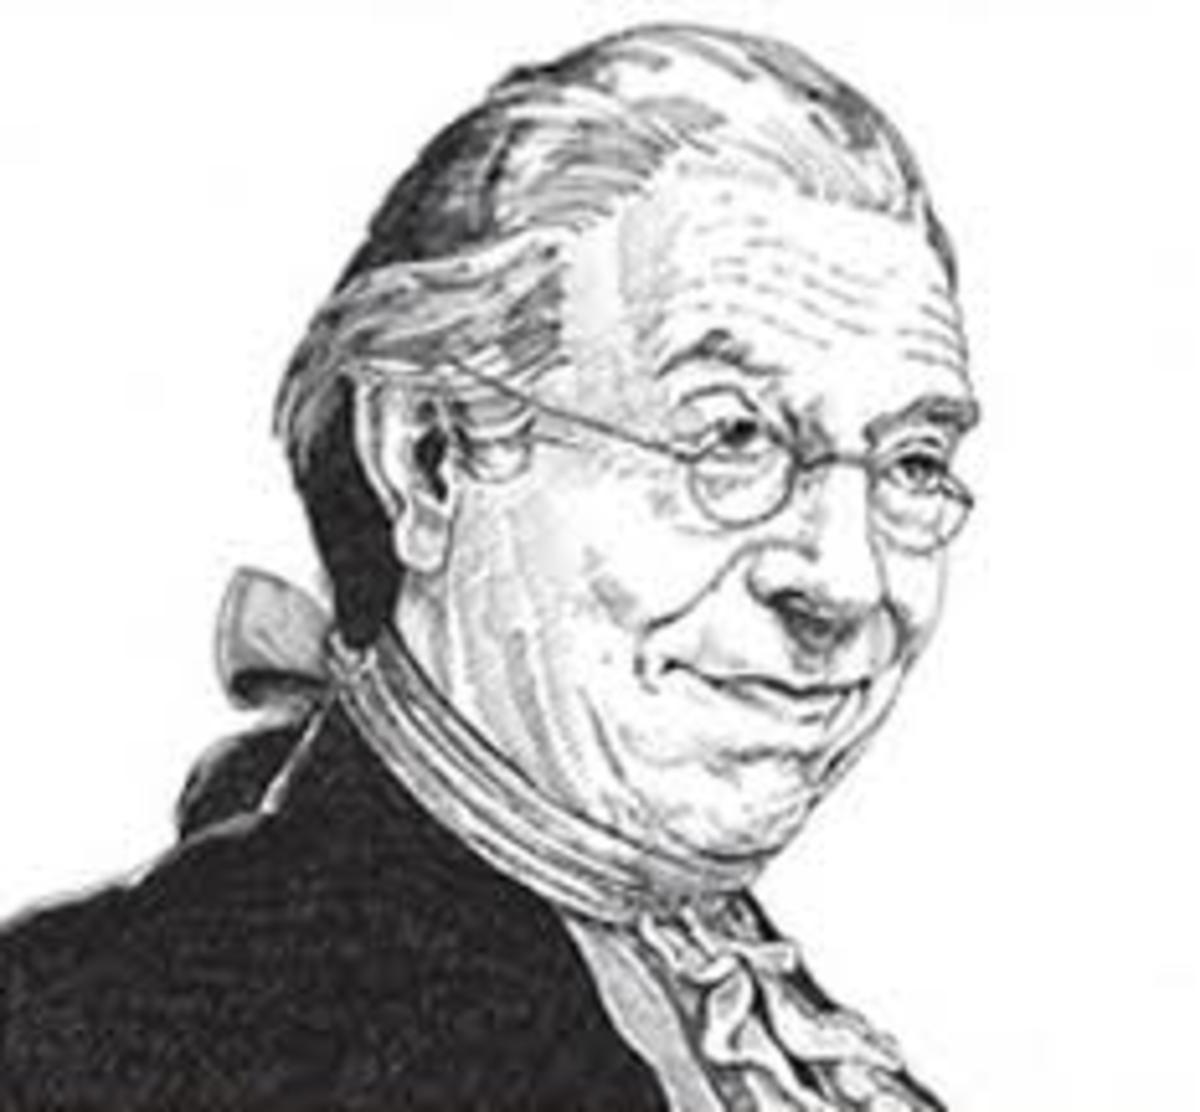 John Newbery, promoter of children's literature.